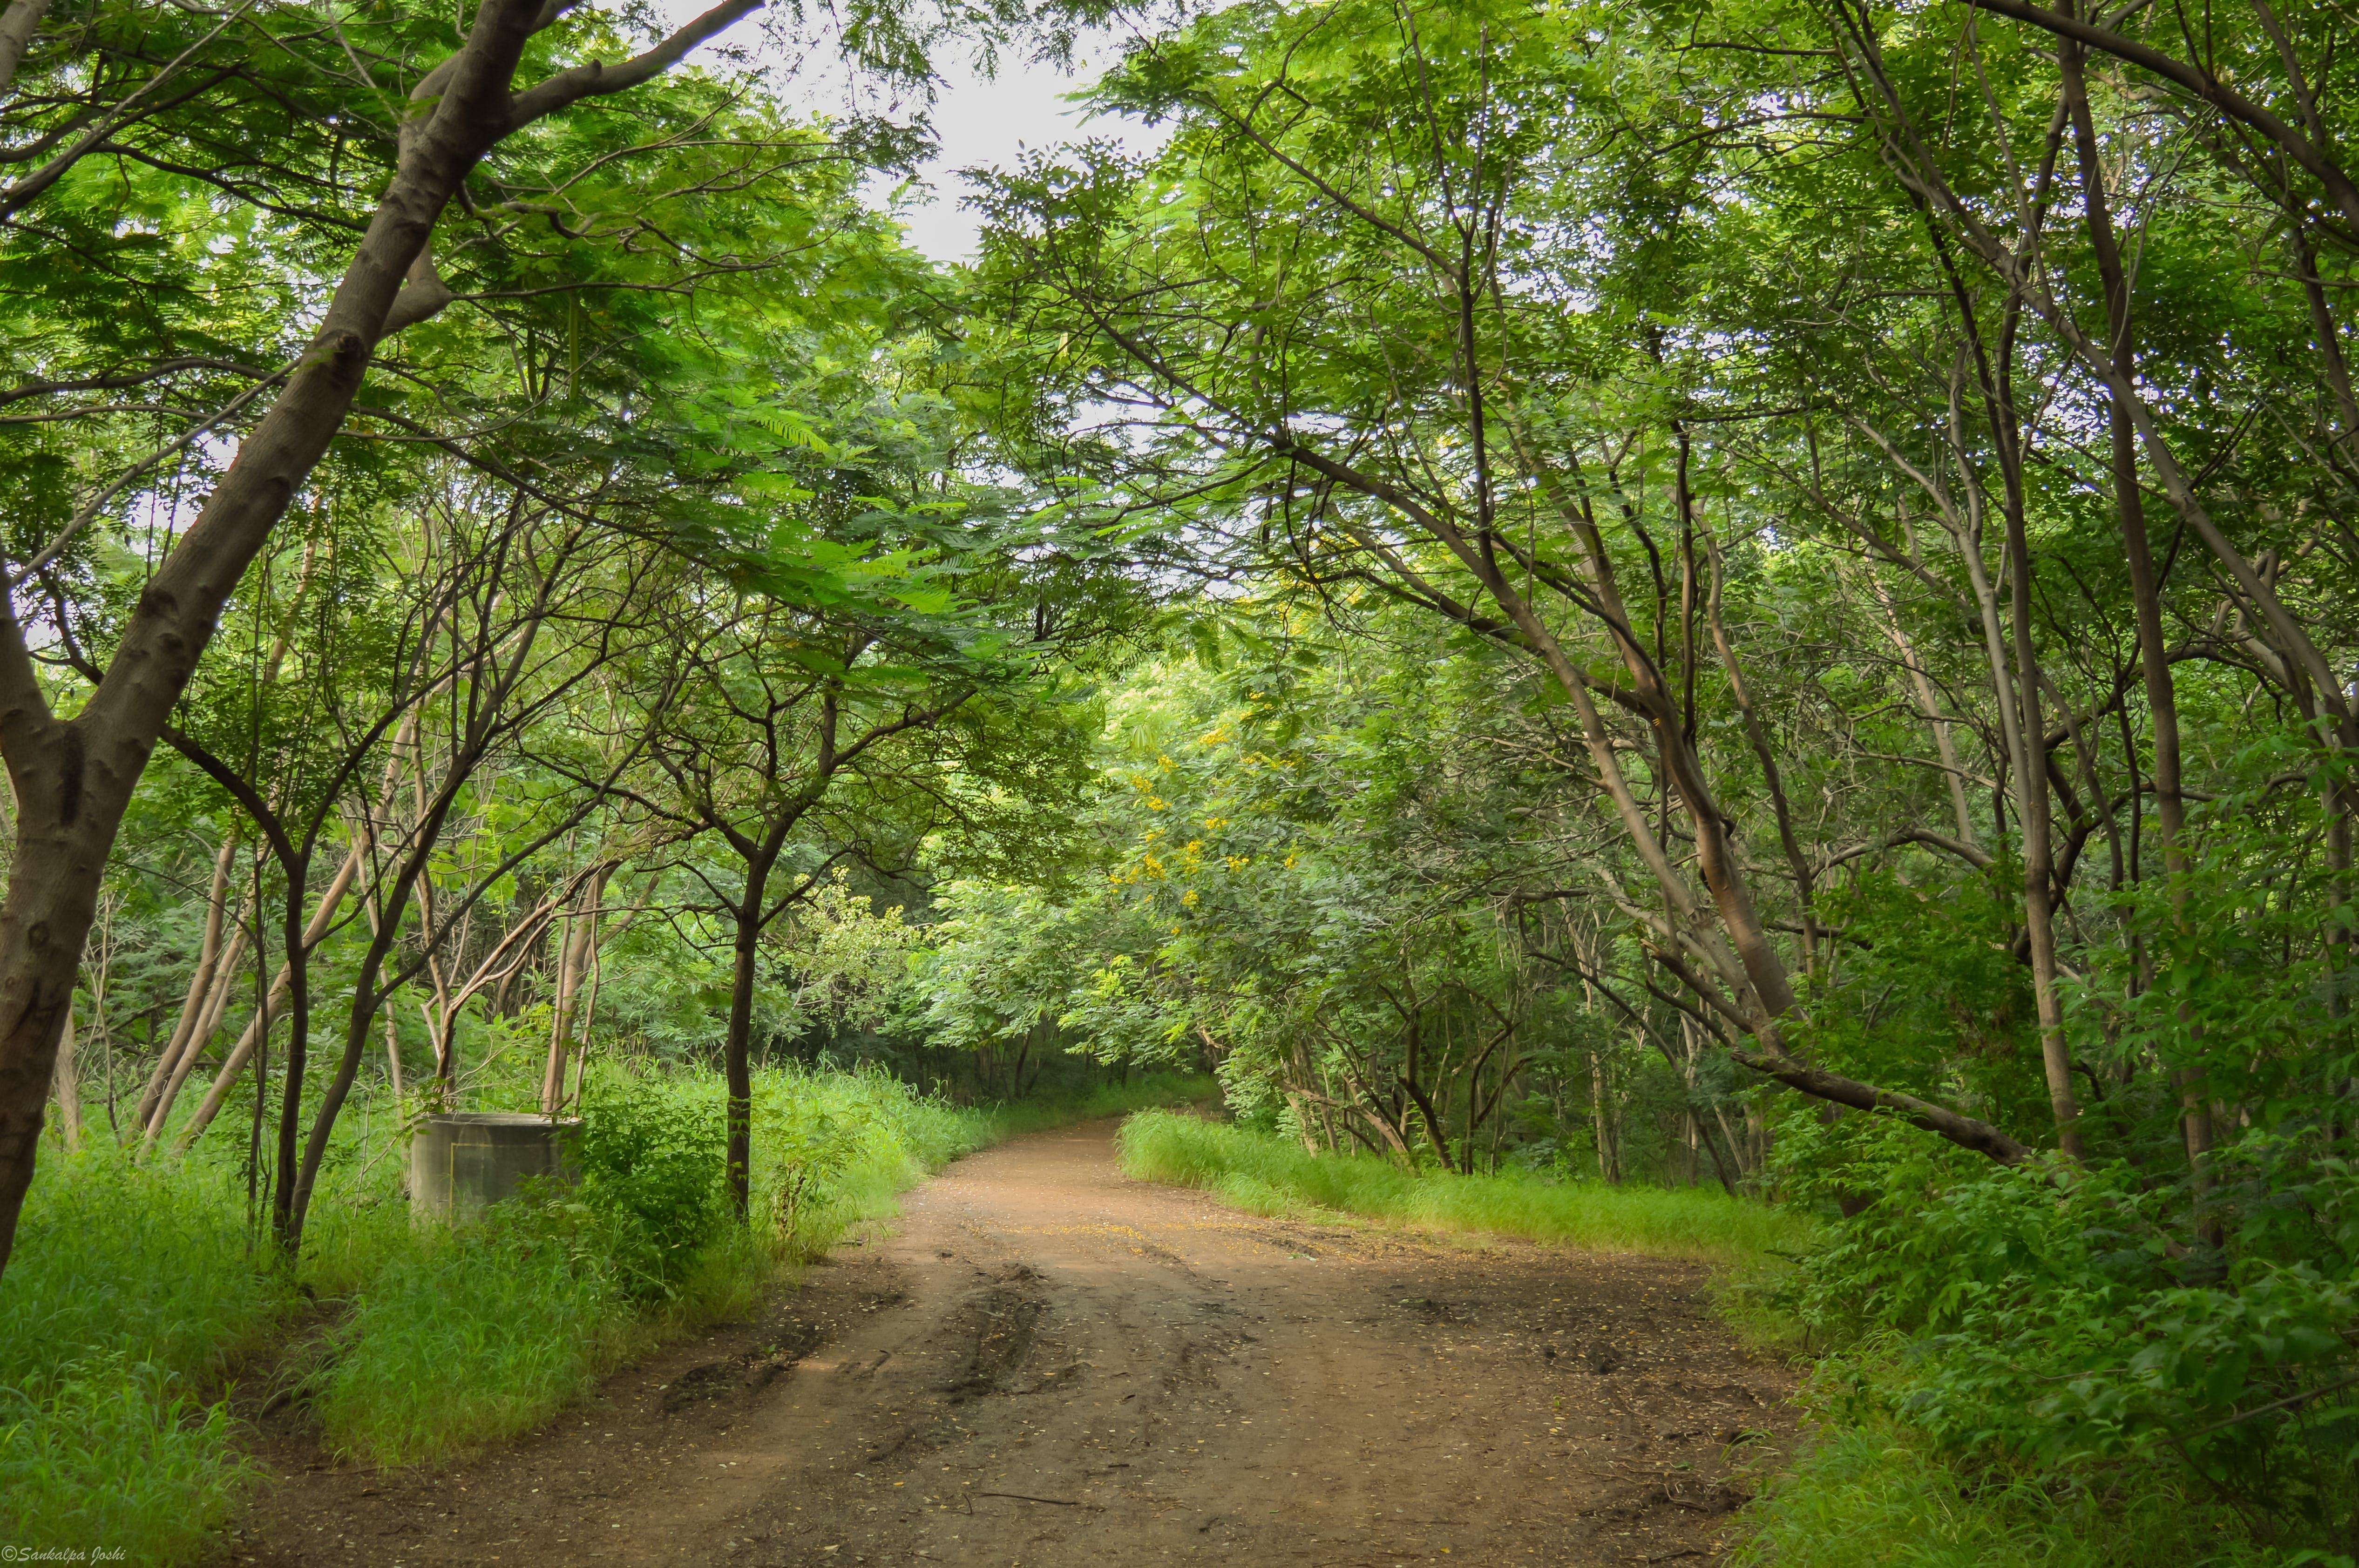 Fotos de stock gratuitas de amateur, bosque, carretera, cubierta forestal